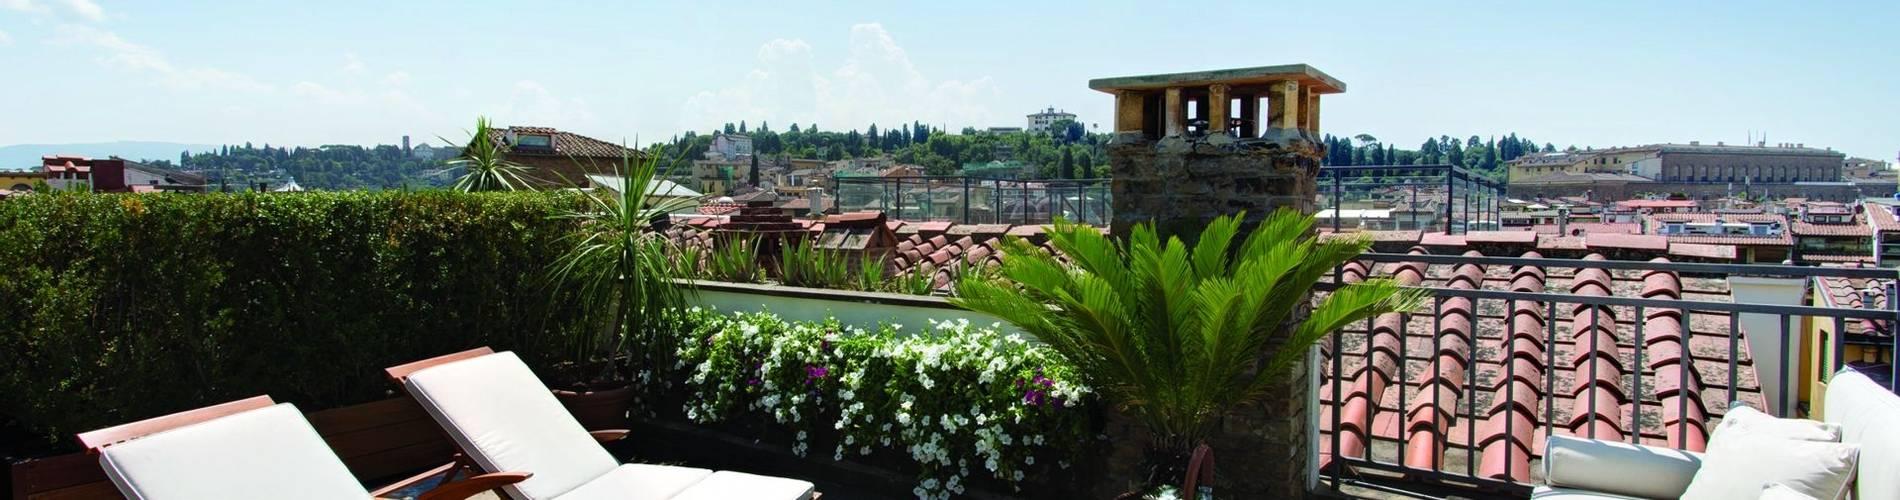 Gallery Art Hotel, Tuscany, Italy, Penthouse Pitti (5).JPG